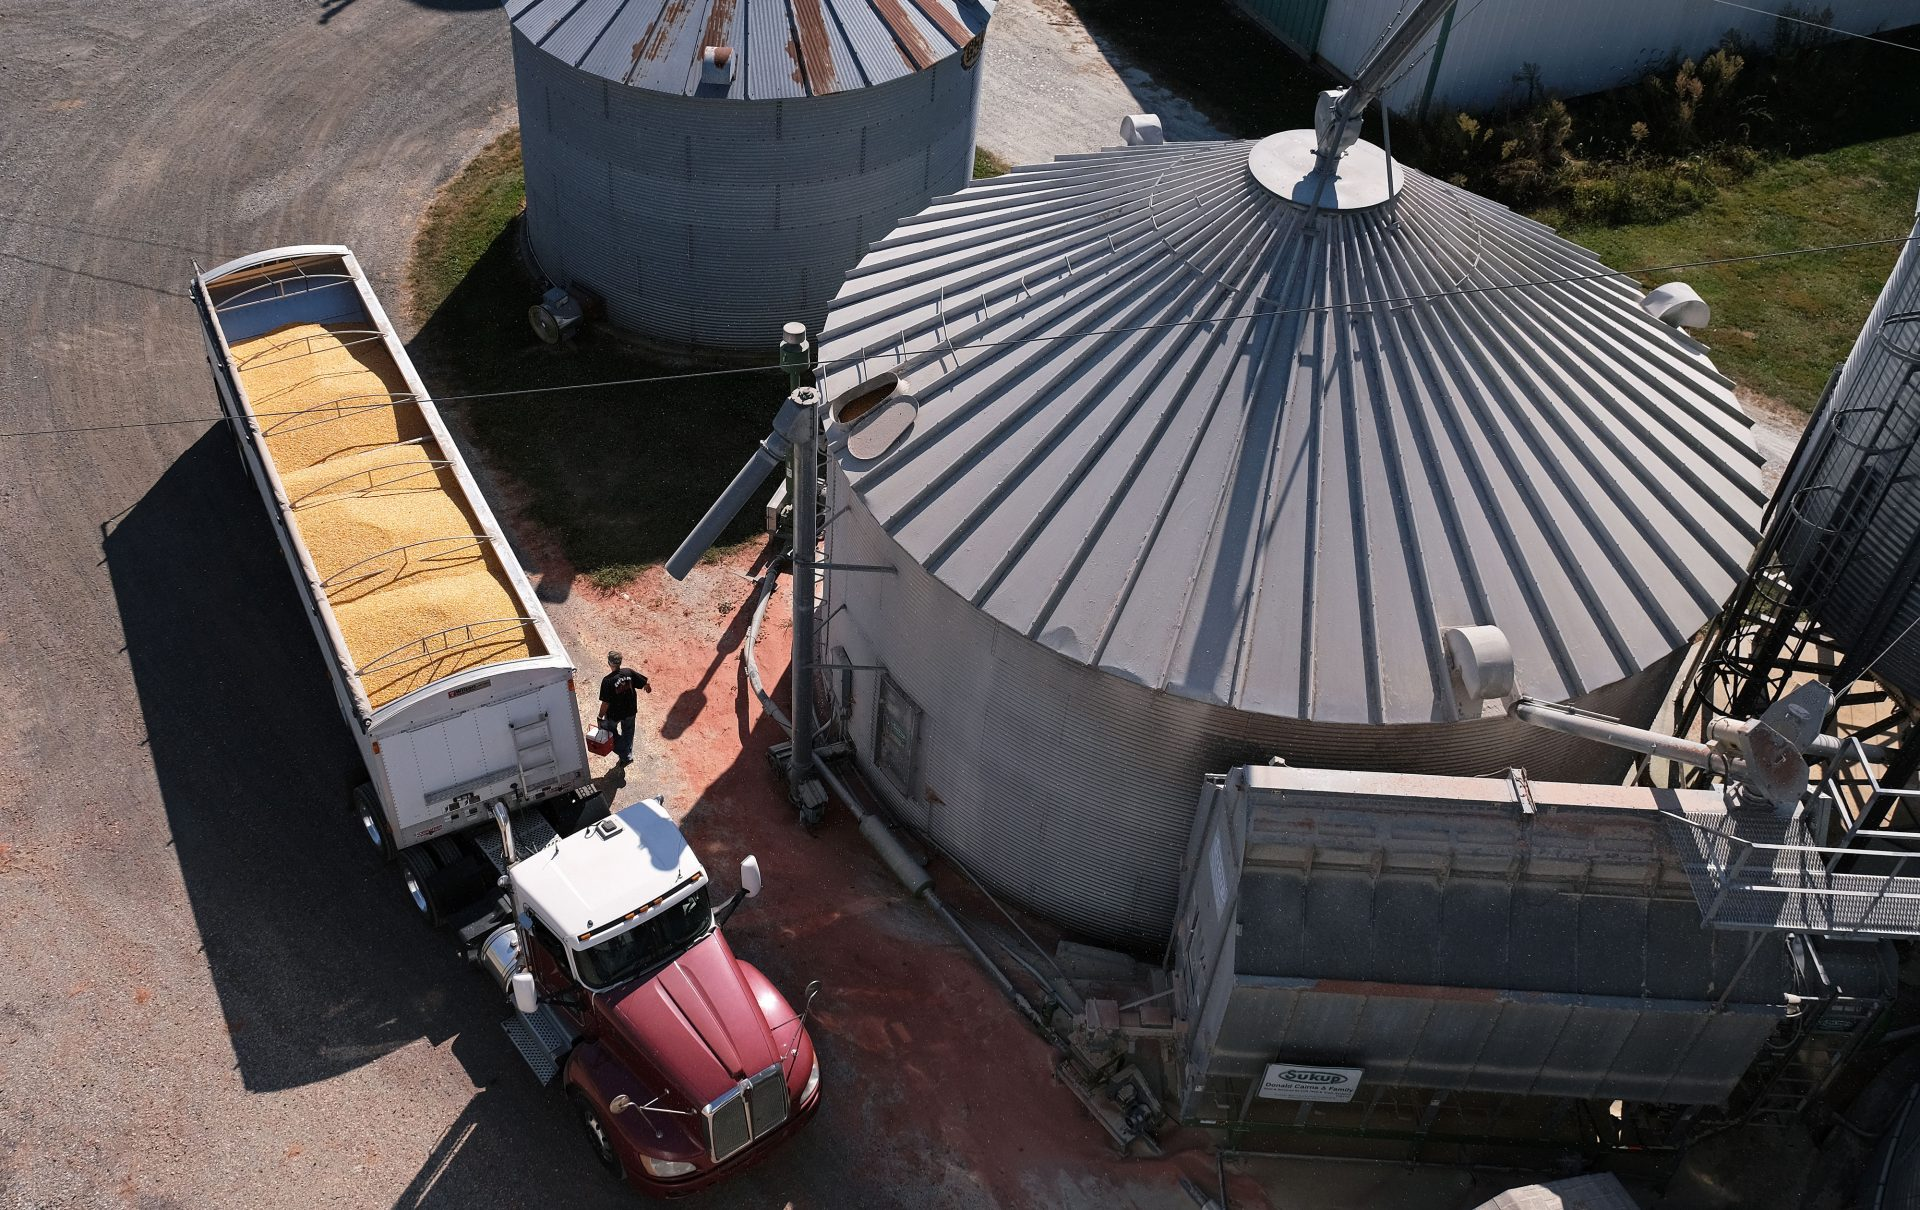 Soybeans grow on land farmed by grain farmer Mike Braucher on Sept. 20, 2019, at Braucher Farms in Centre Township, Pennsylvania.